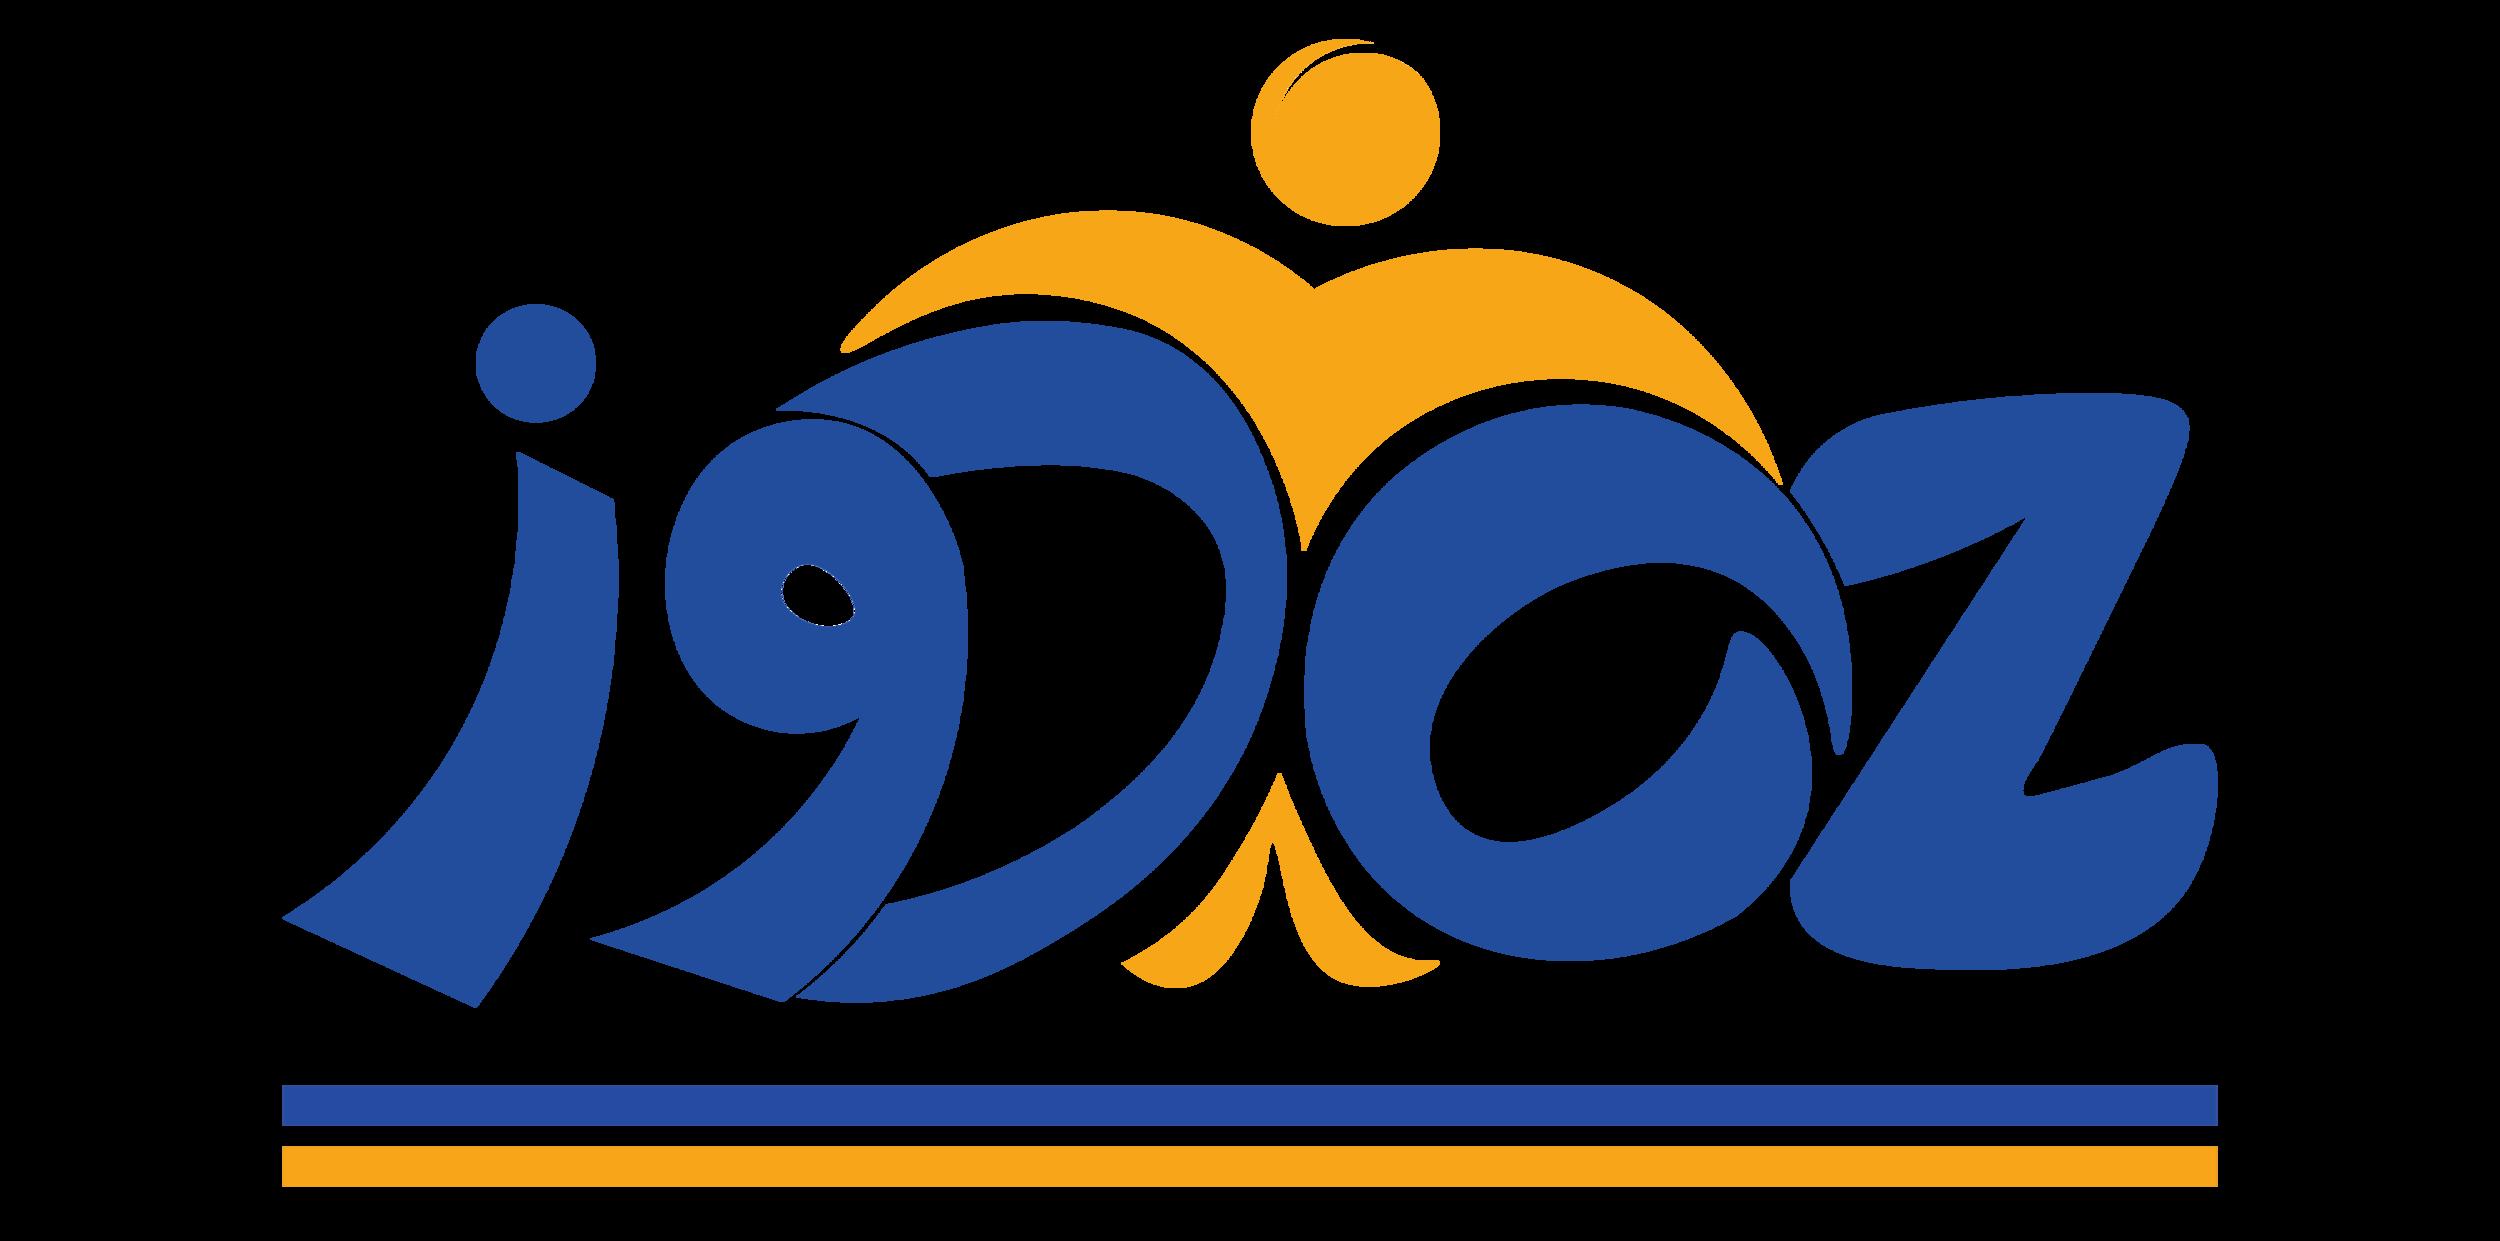 Doz-Logo-7-official-top-lienie.png